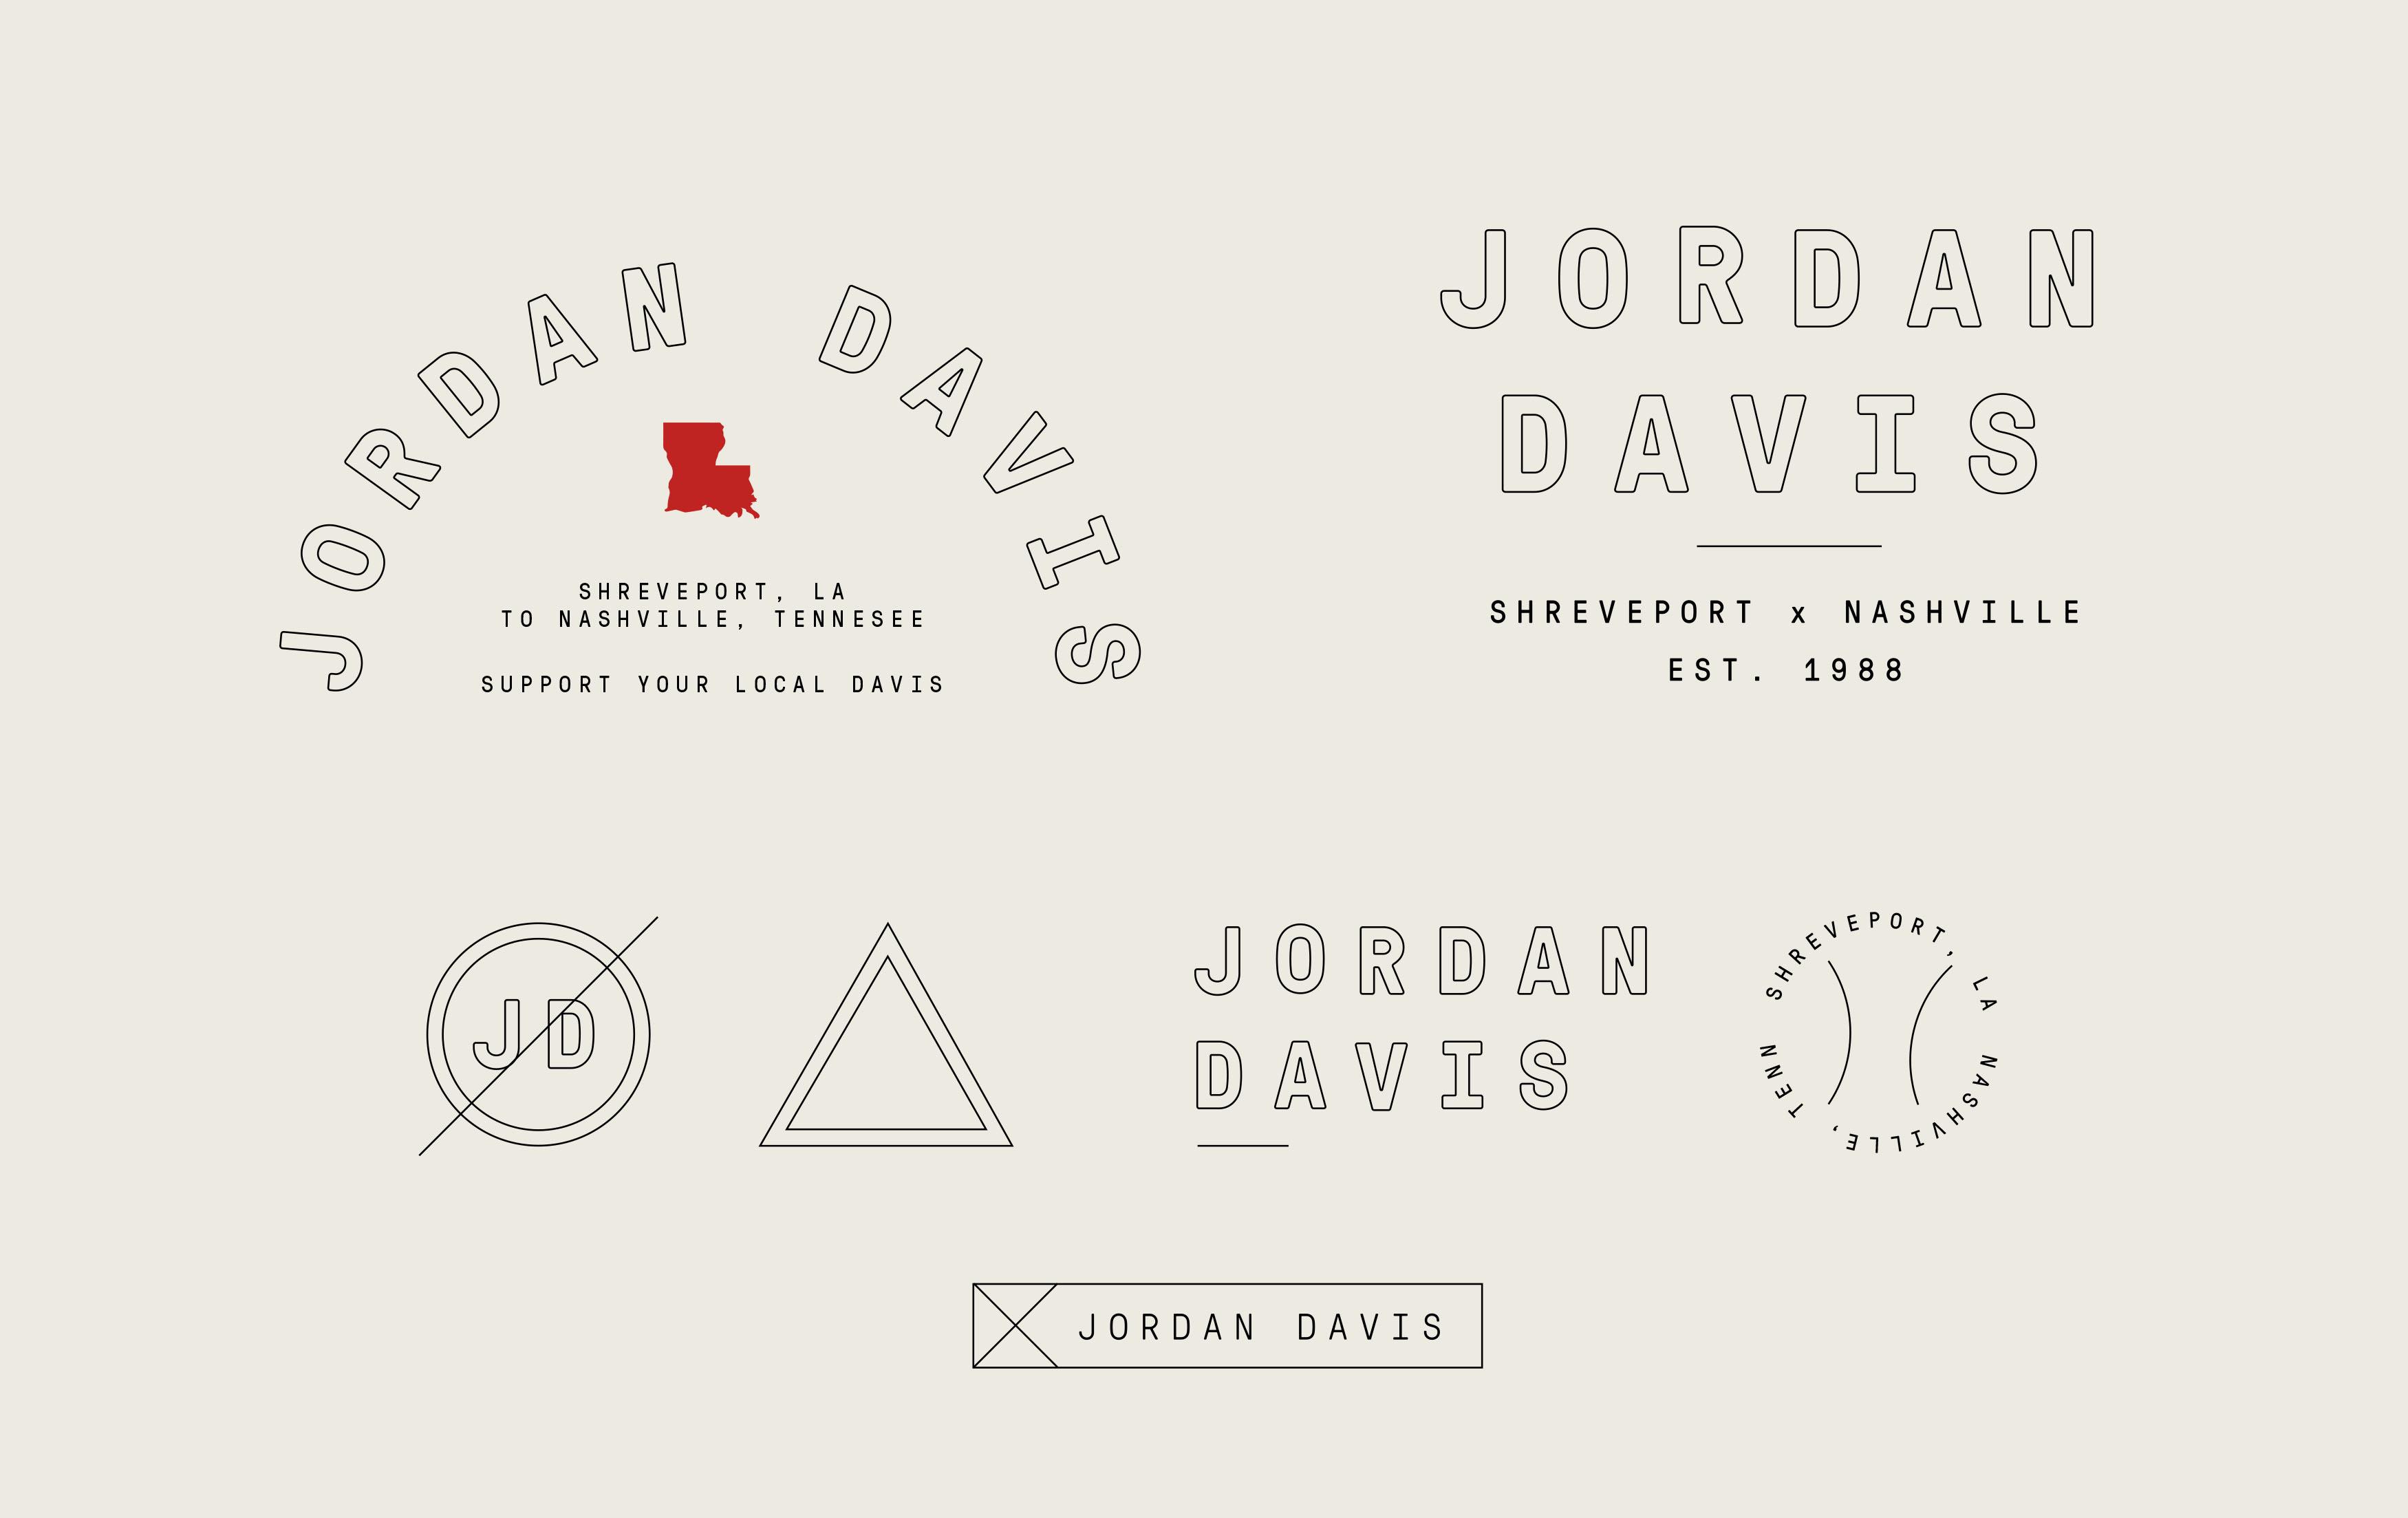 Jordan Davis - Judson Collier is a Graphic Designer and